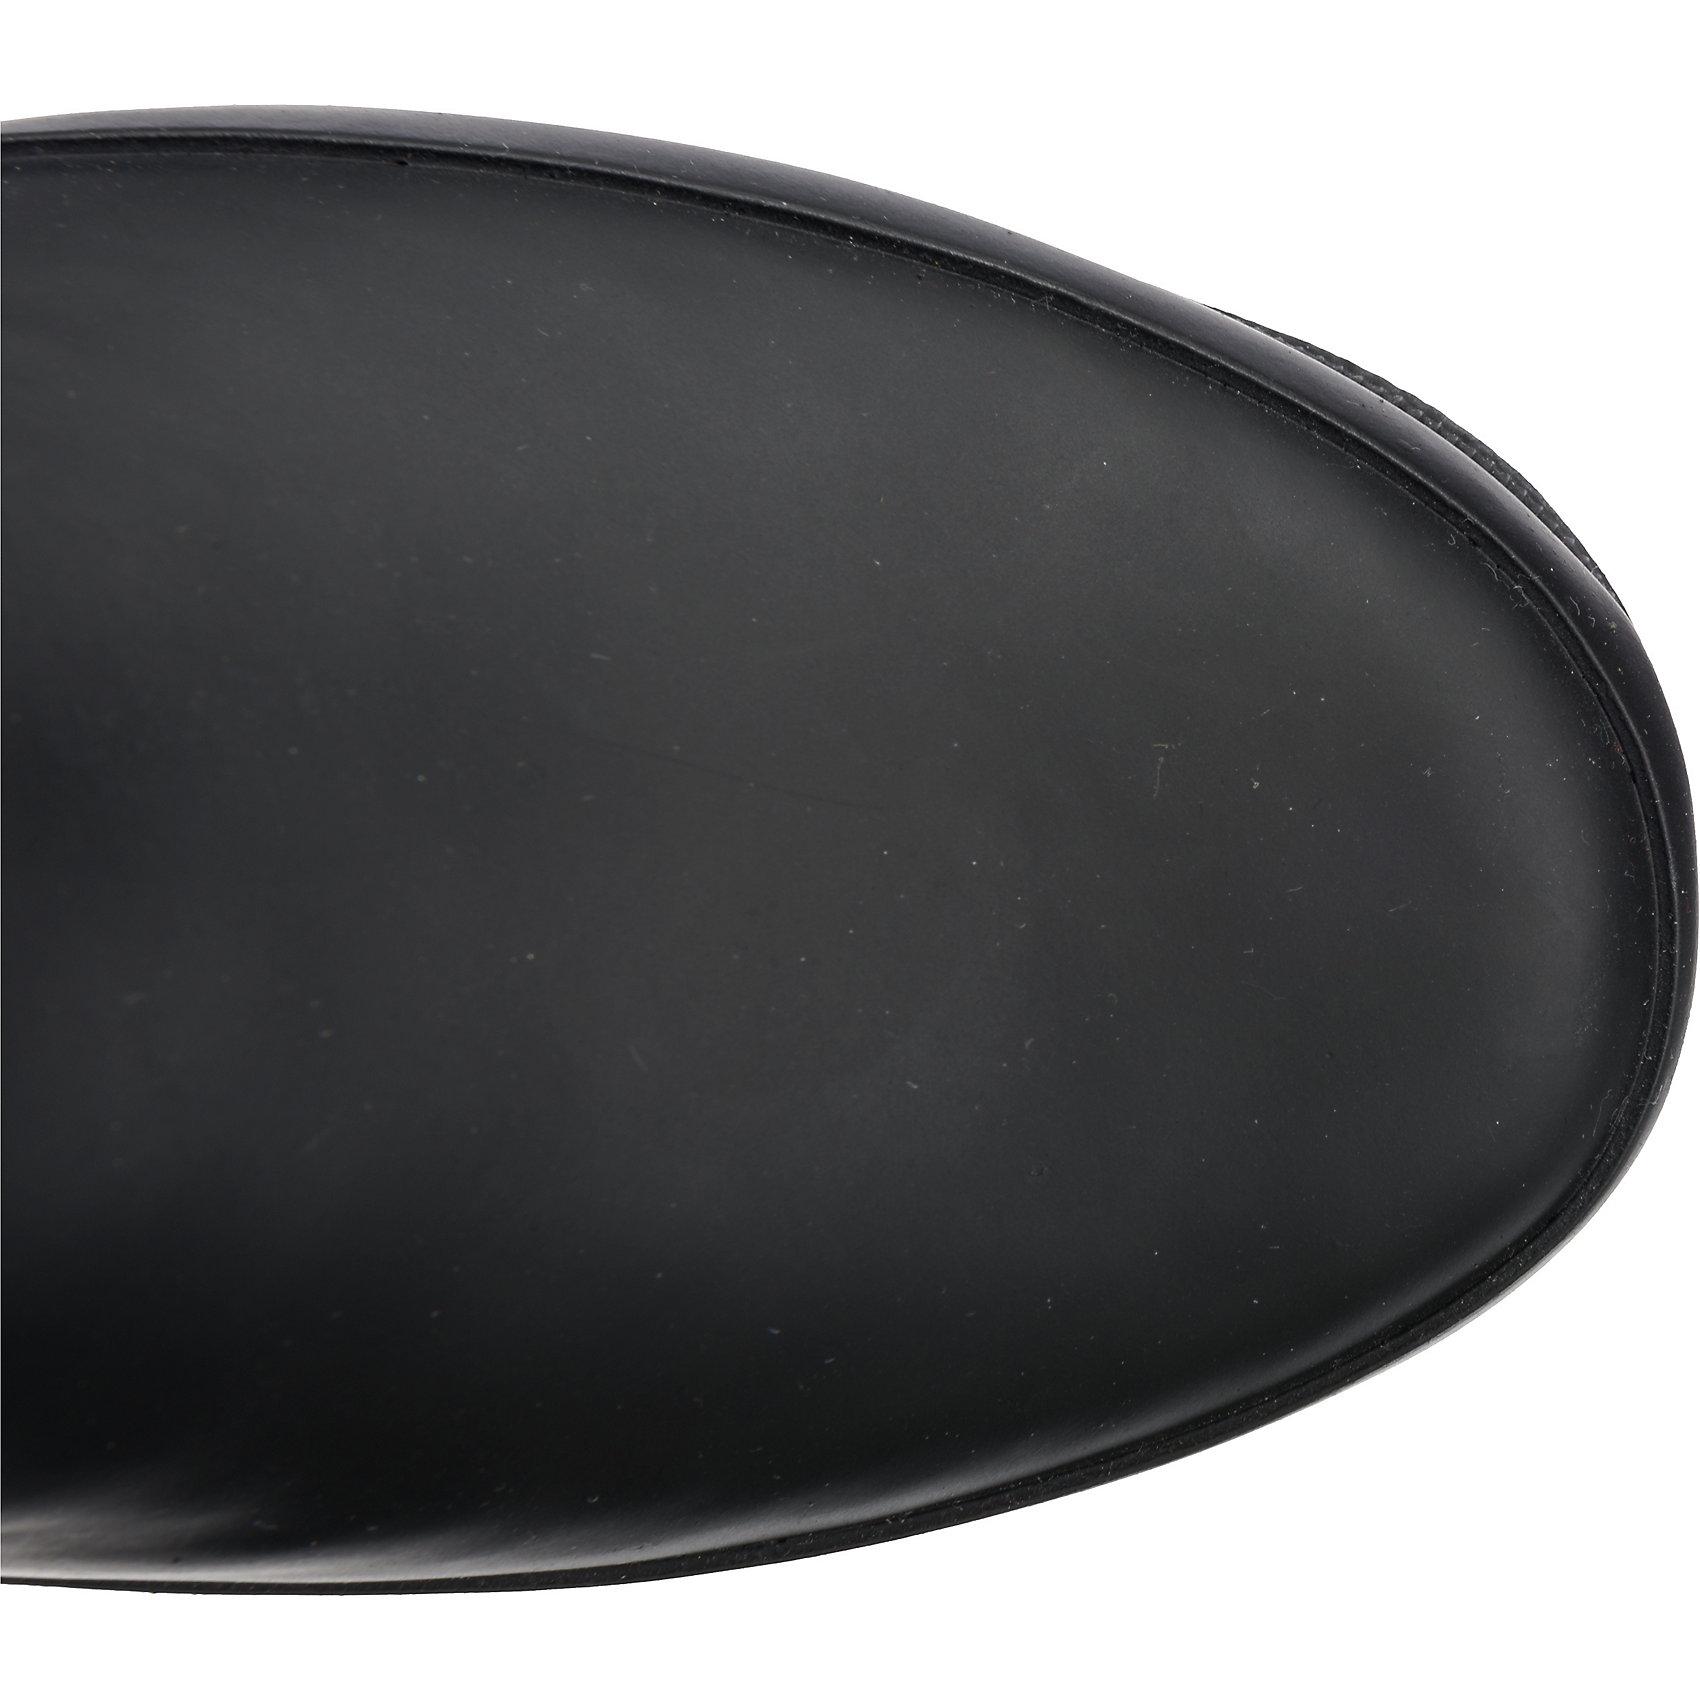 official photos 428ce 5d84c ... V37 V37 V37 Nike Air Jordan 1 Flight 4 Prem Basketball Shoes 838818-031  b624ee ...